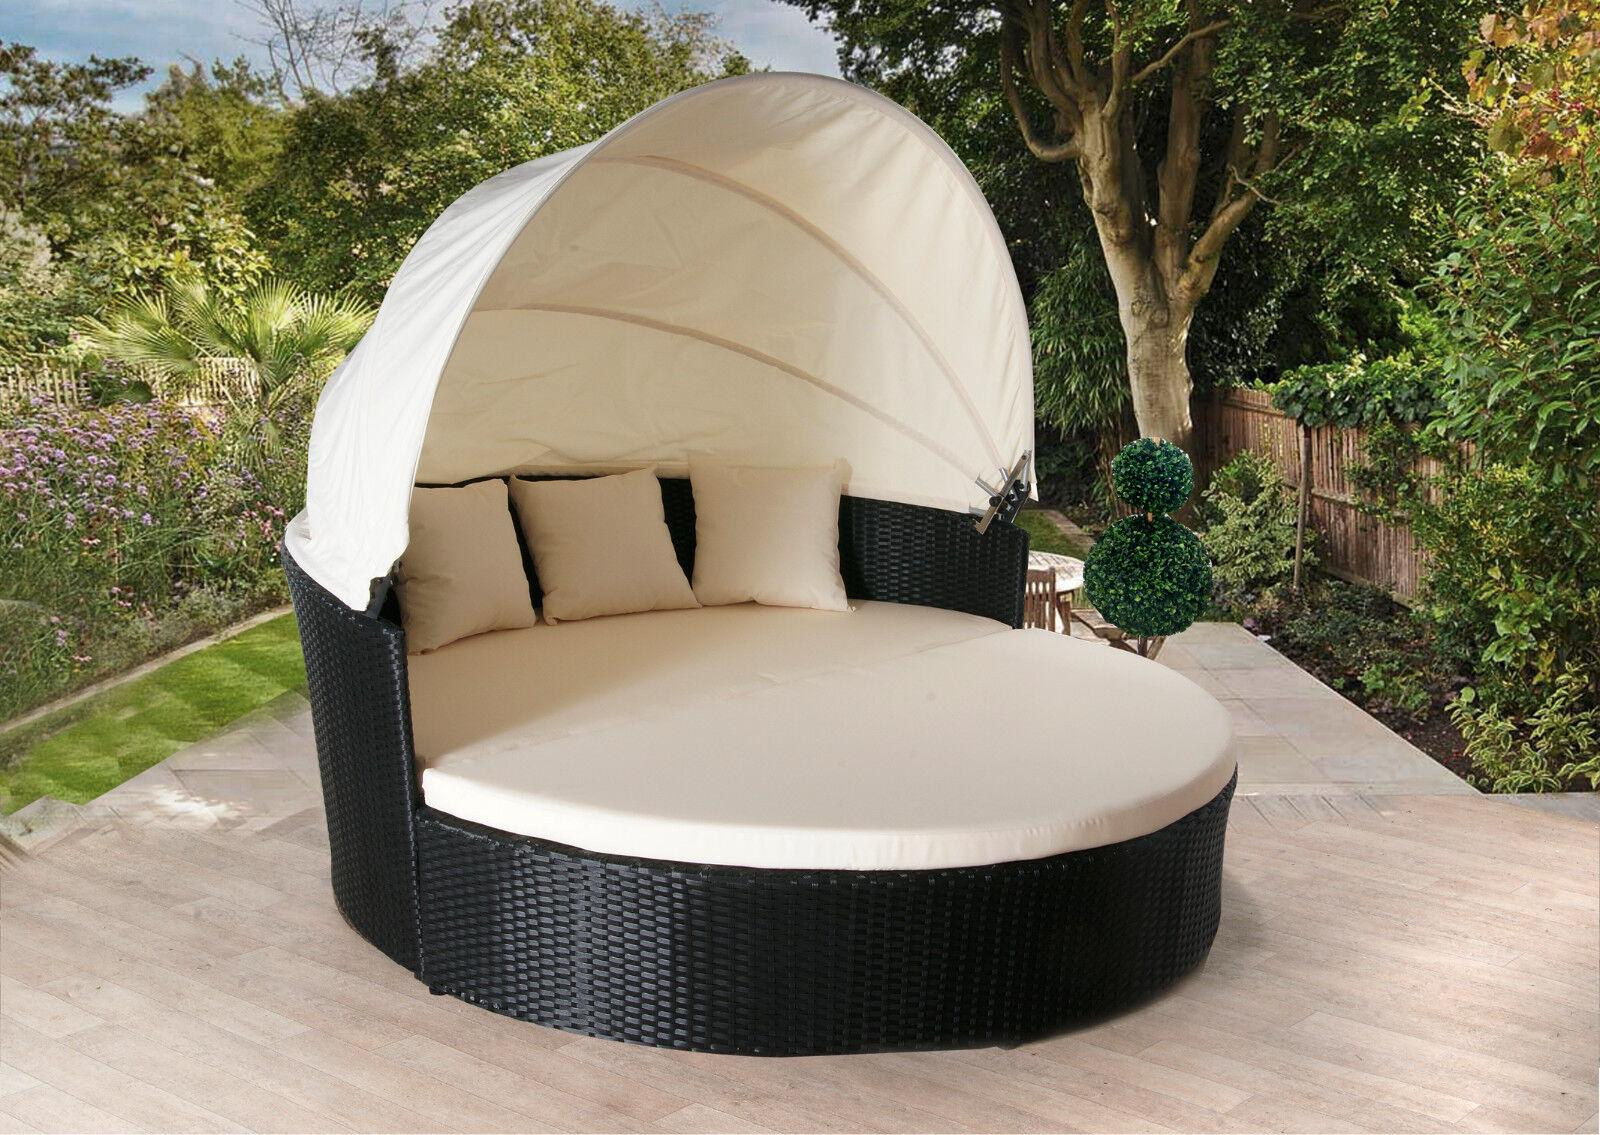 Garden Furniture - RATTAN DAY BED RATTAN GARDEN FURNITURE SOFA LOUNGER OUTDOOR PATIO WICKER NEW